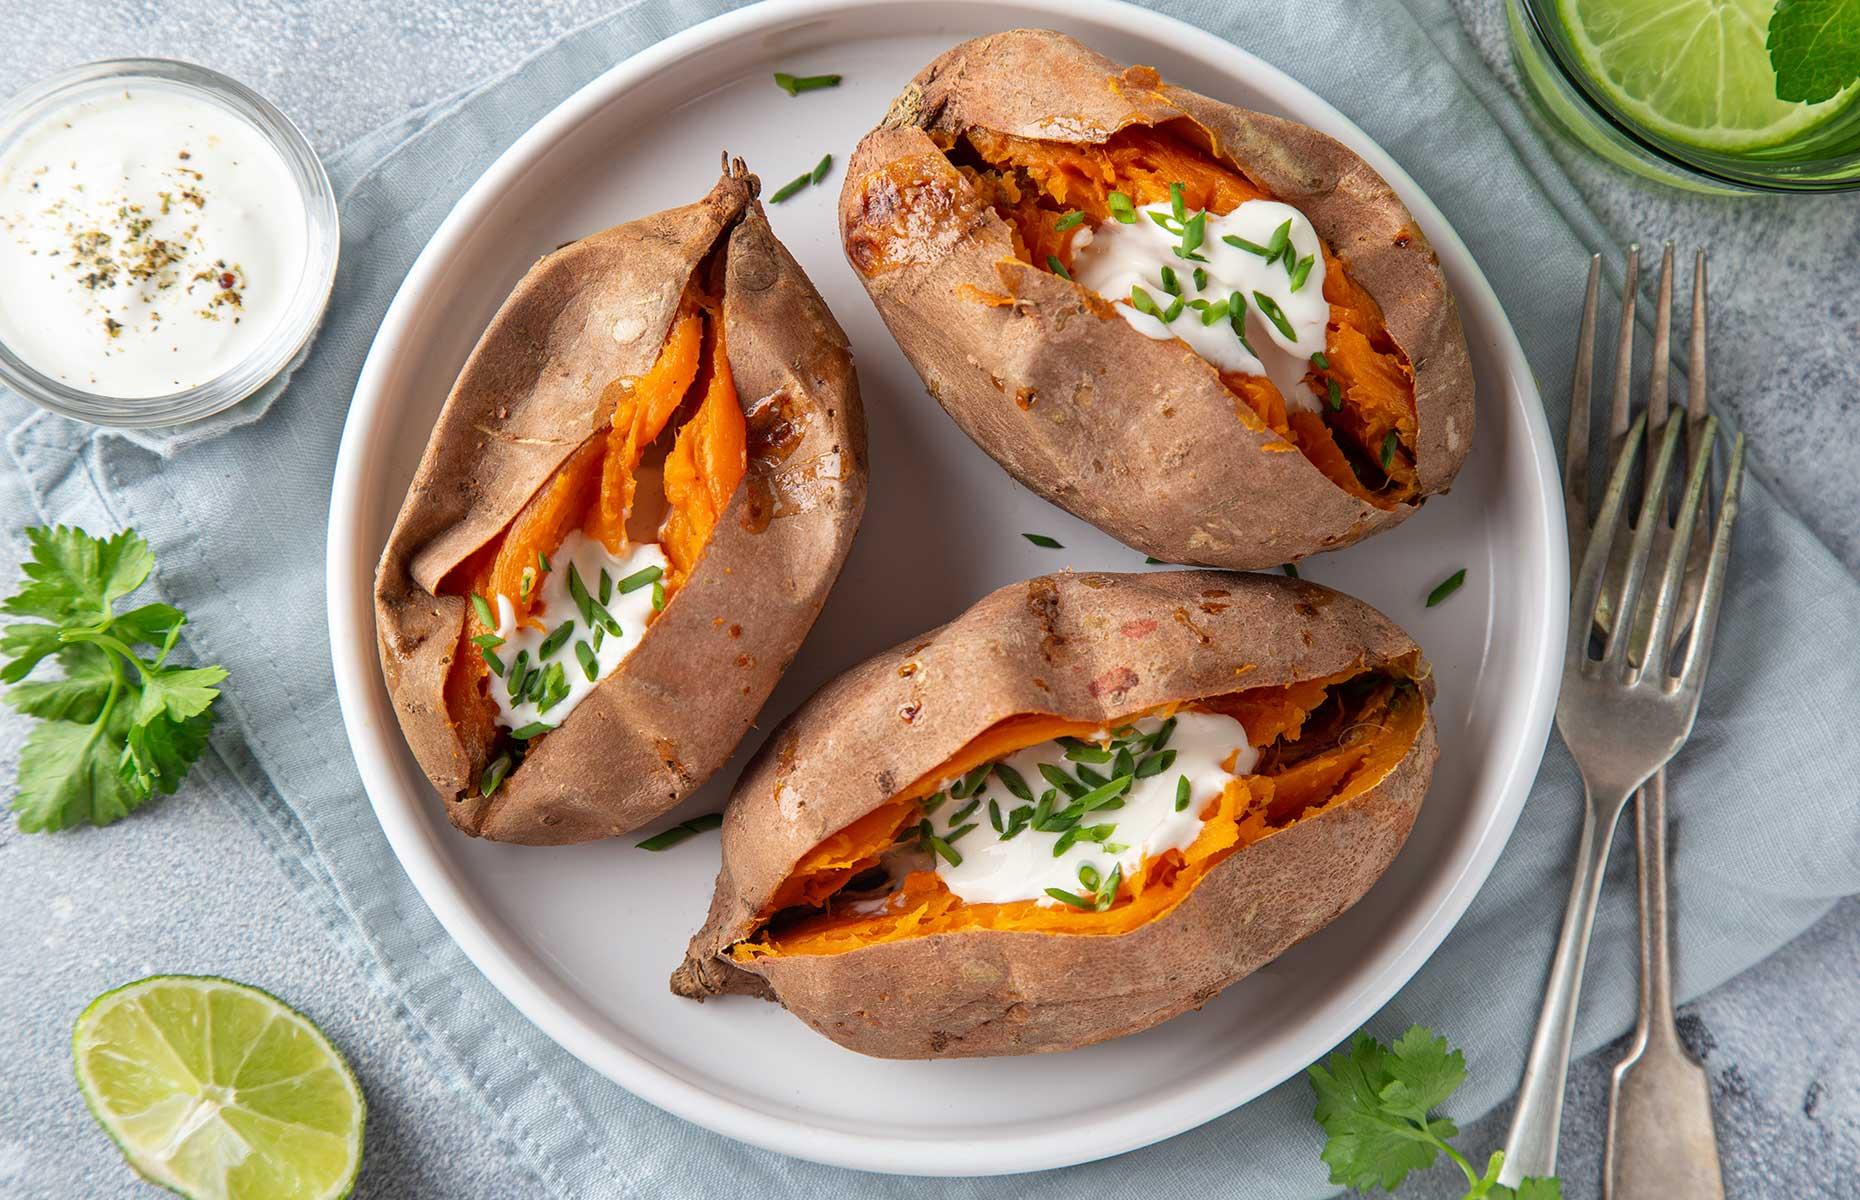 Baked sweet potato with yogurt (Image: Anna Shepulova/Shutterstock)